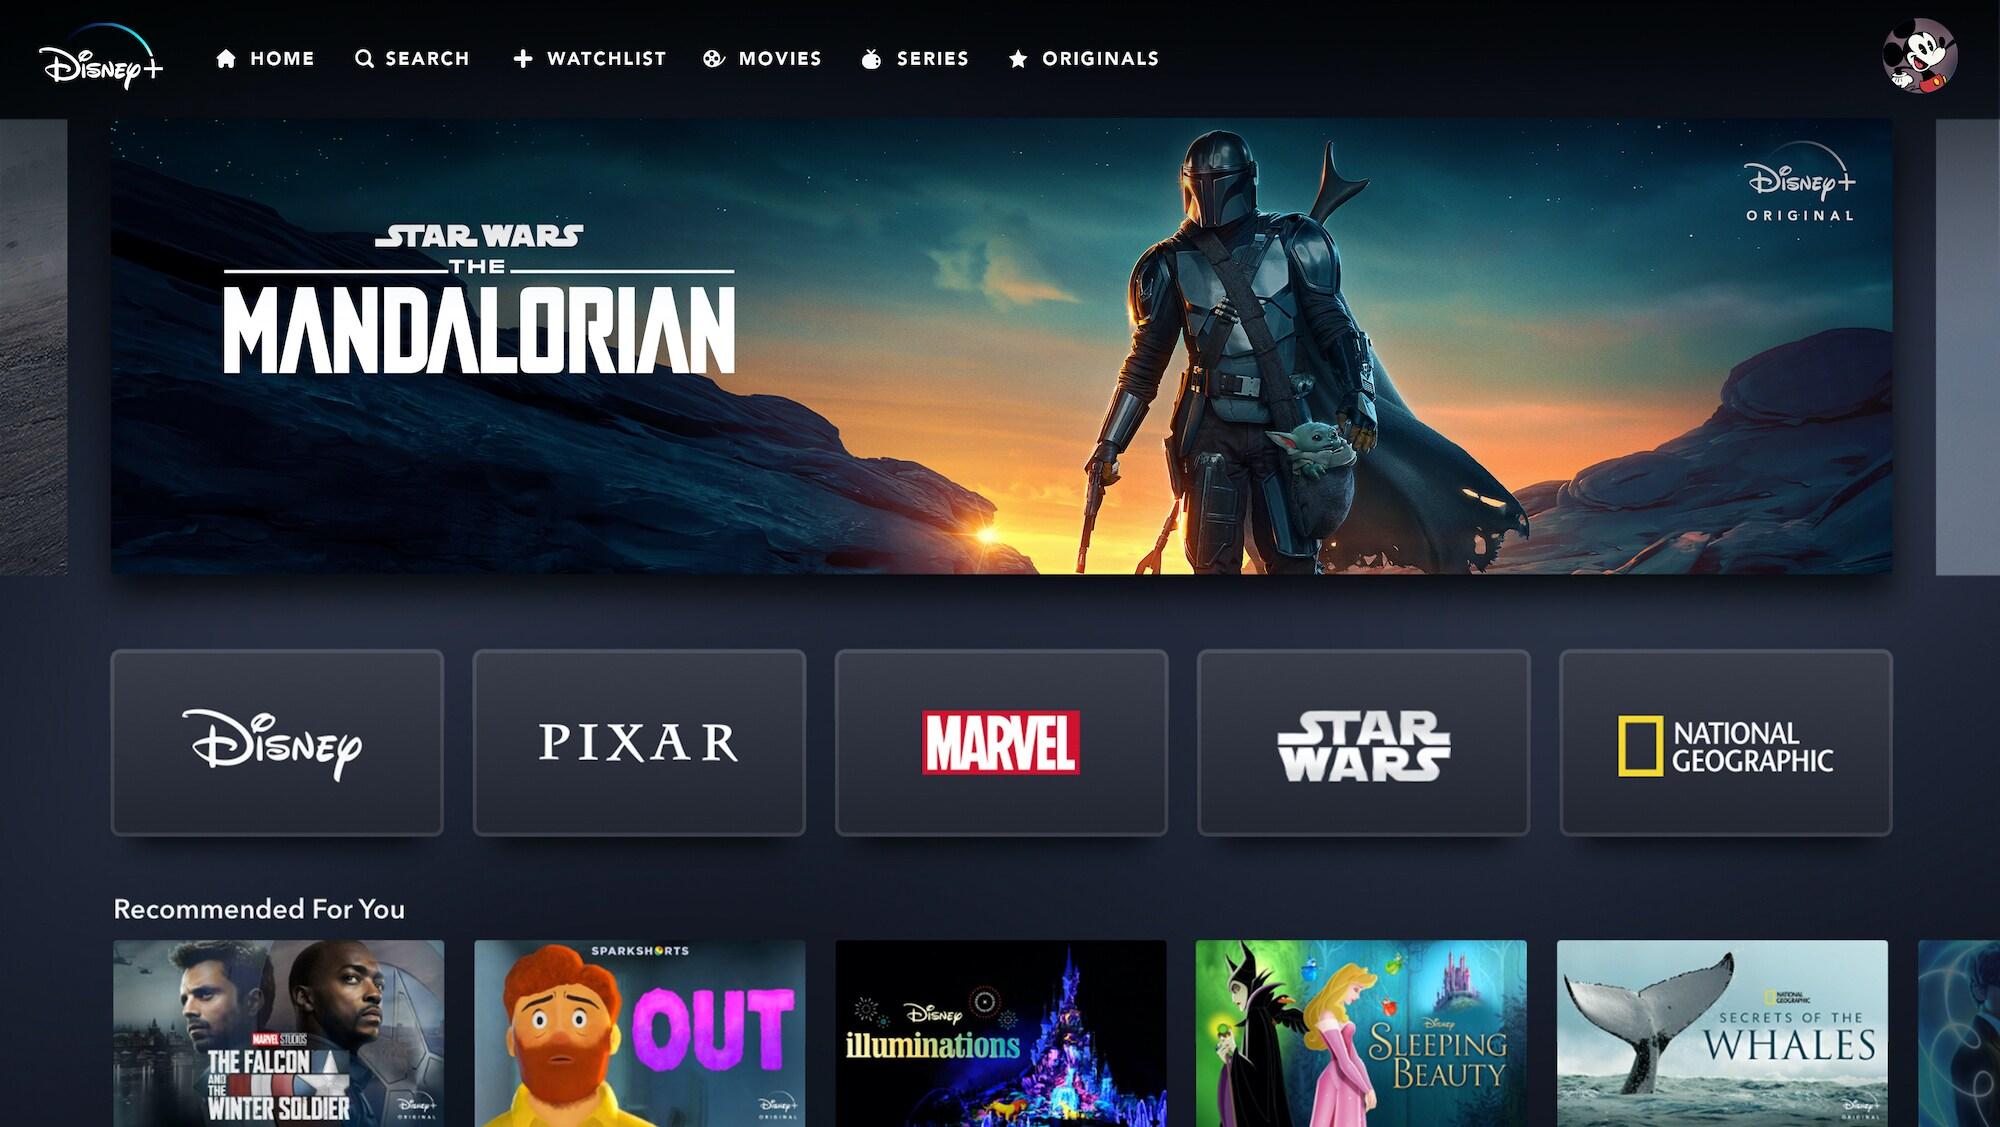 Disney+ App Home Page on Web